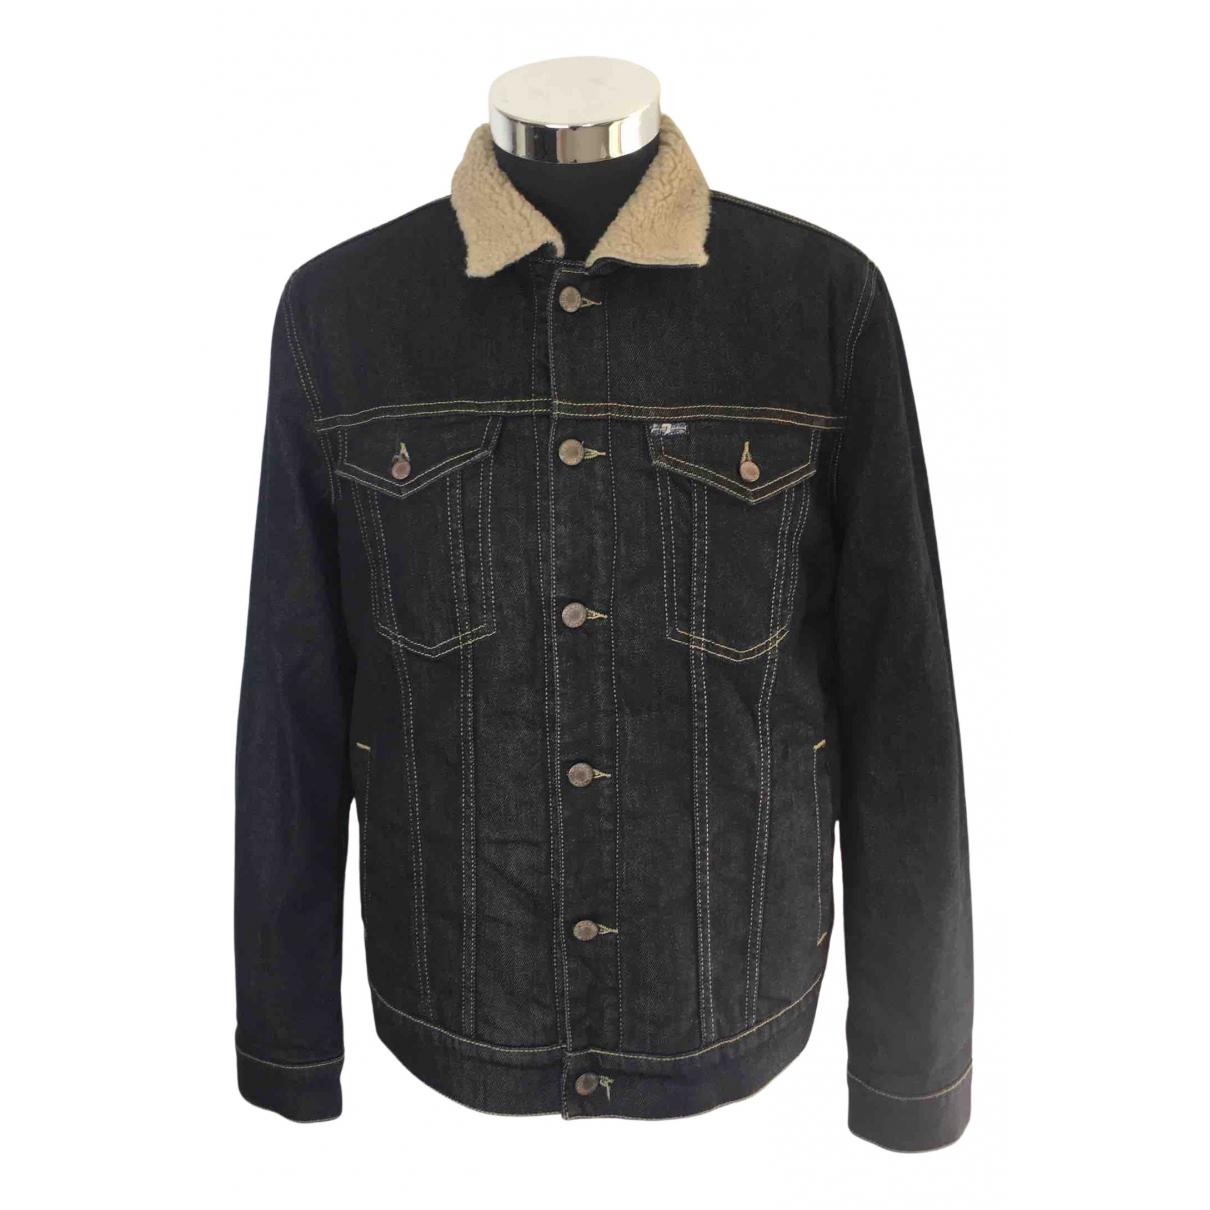 7 For All Mankind N Navy Denim - Jeans jacket  for Men M International